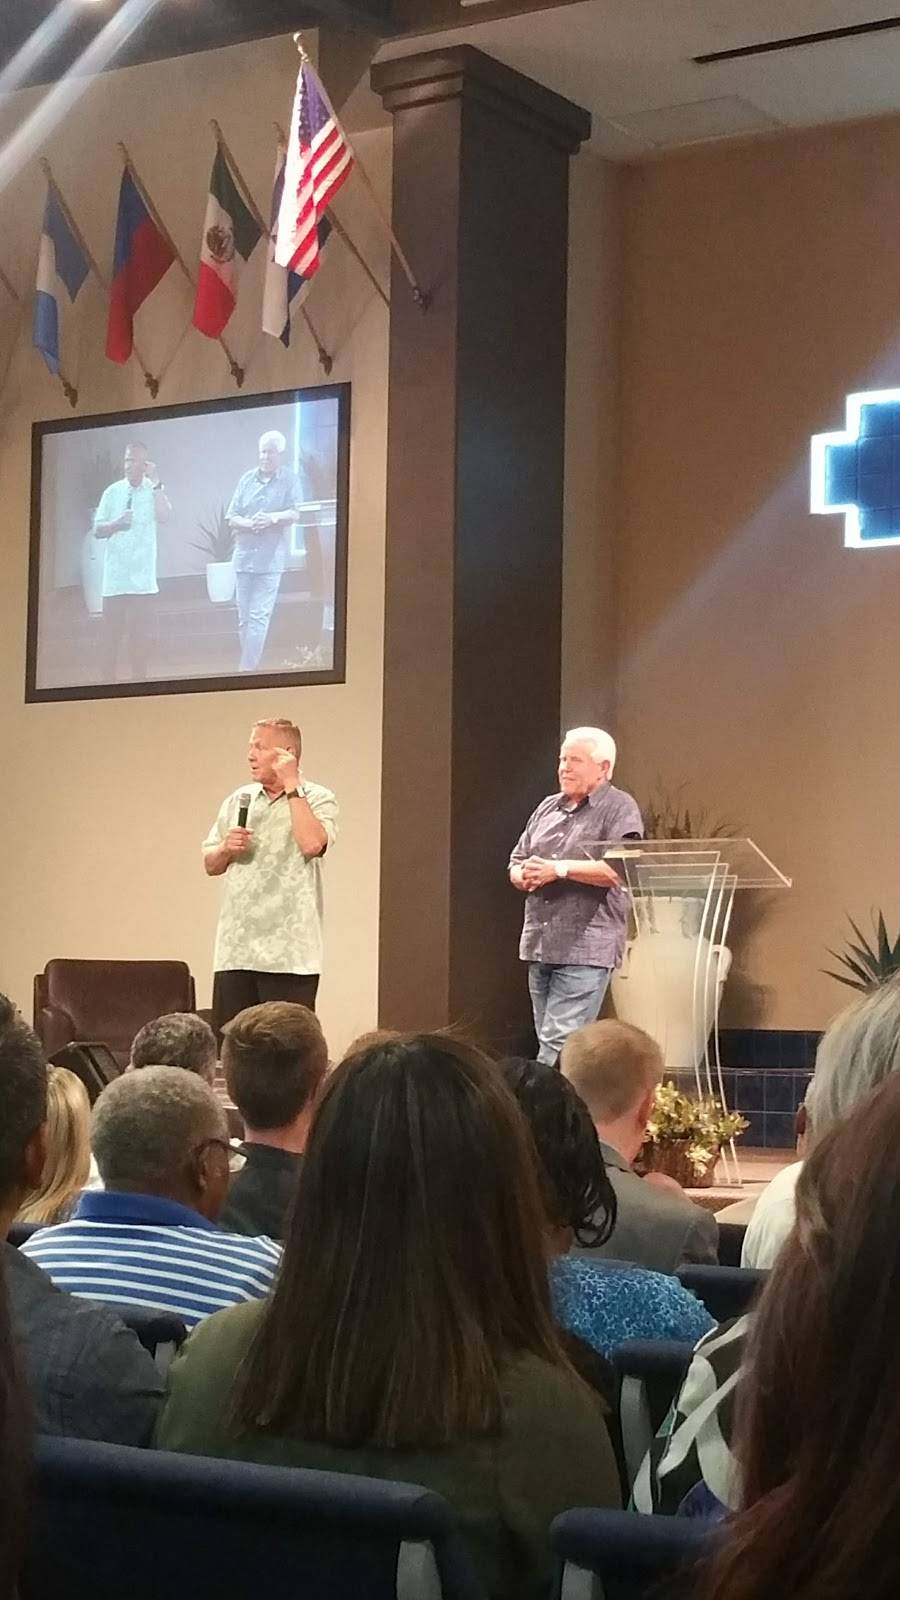 Kern Christian Center - church  | Photo 2 of 2 | Address: 4701 Gosford Rd, Bakersfield, CA 93313, USA | Phone: (661) 664-1000